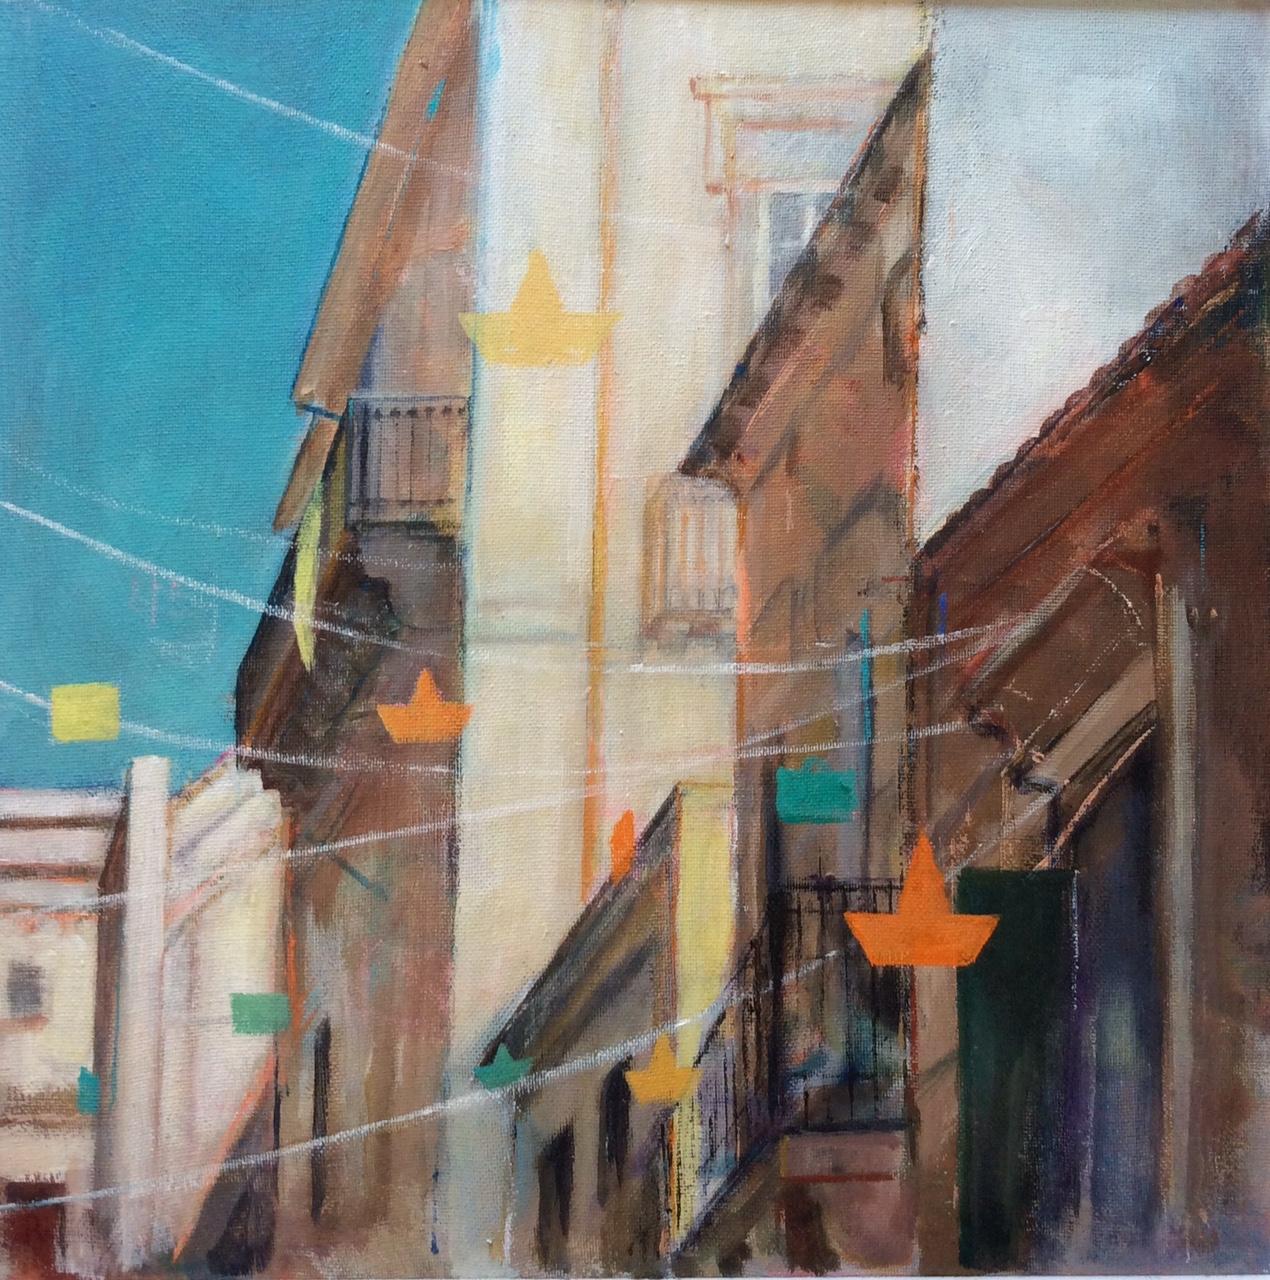 'Festa', Noto, Sicily - acrylic on canvas